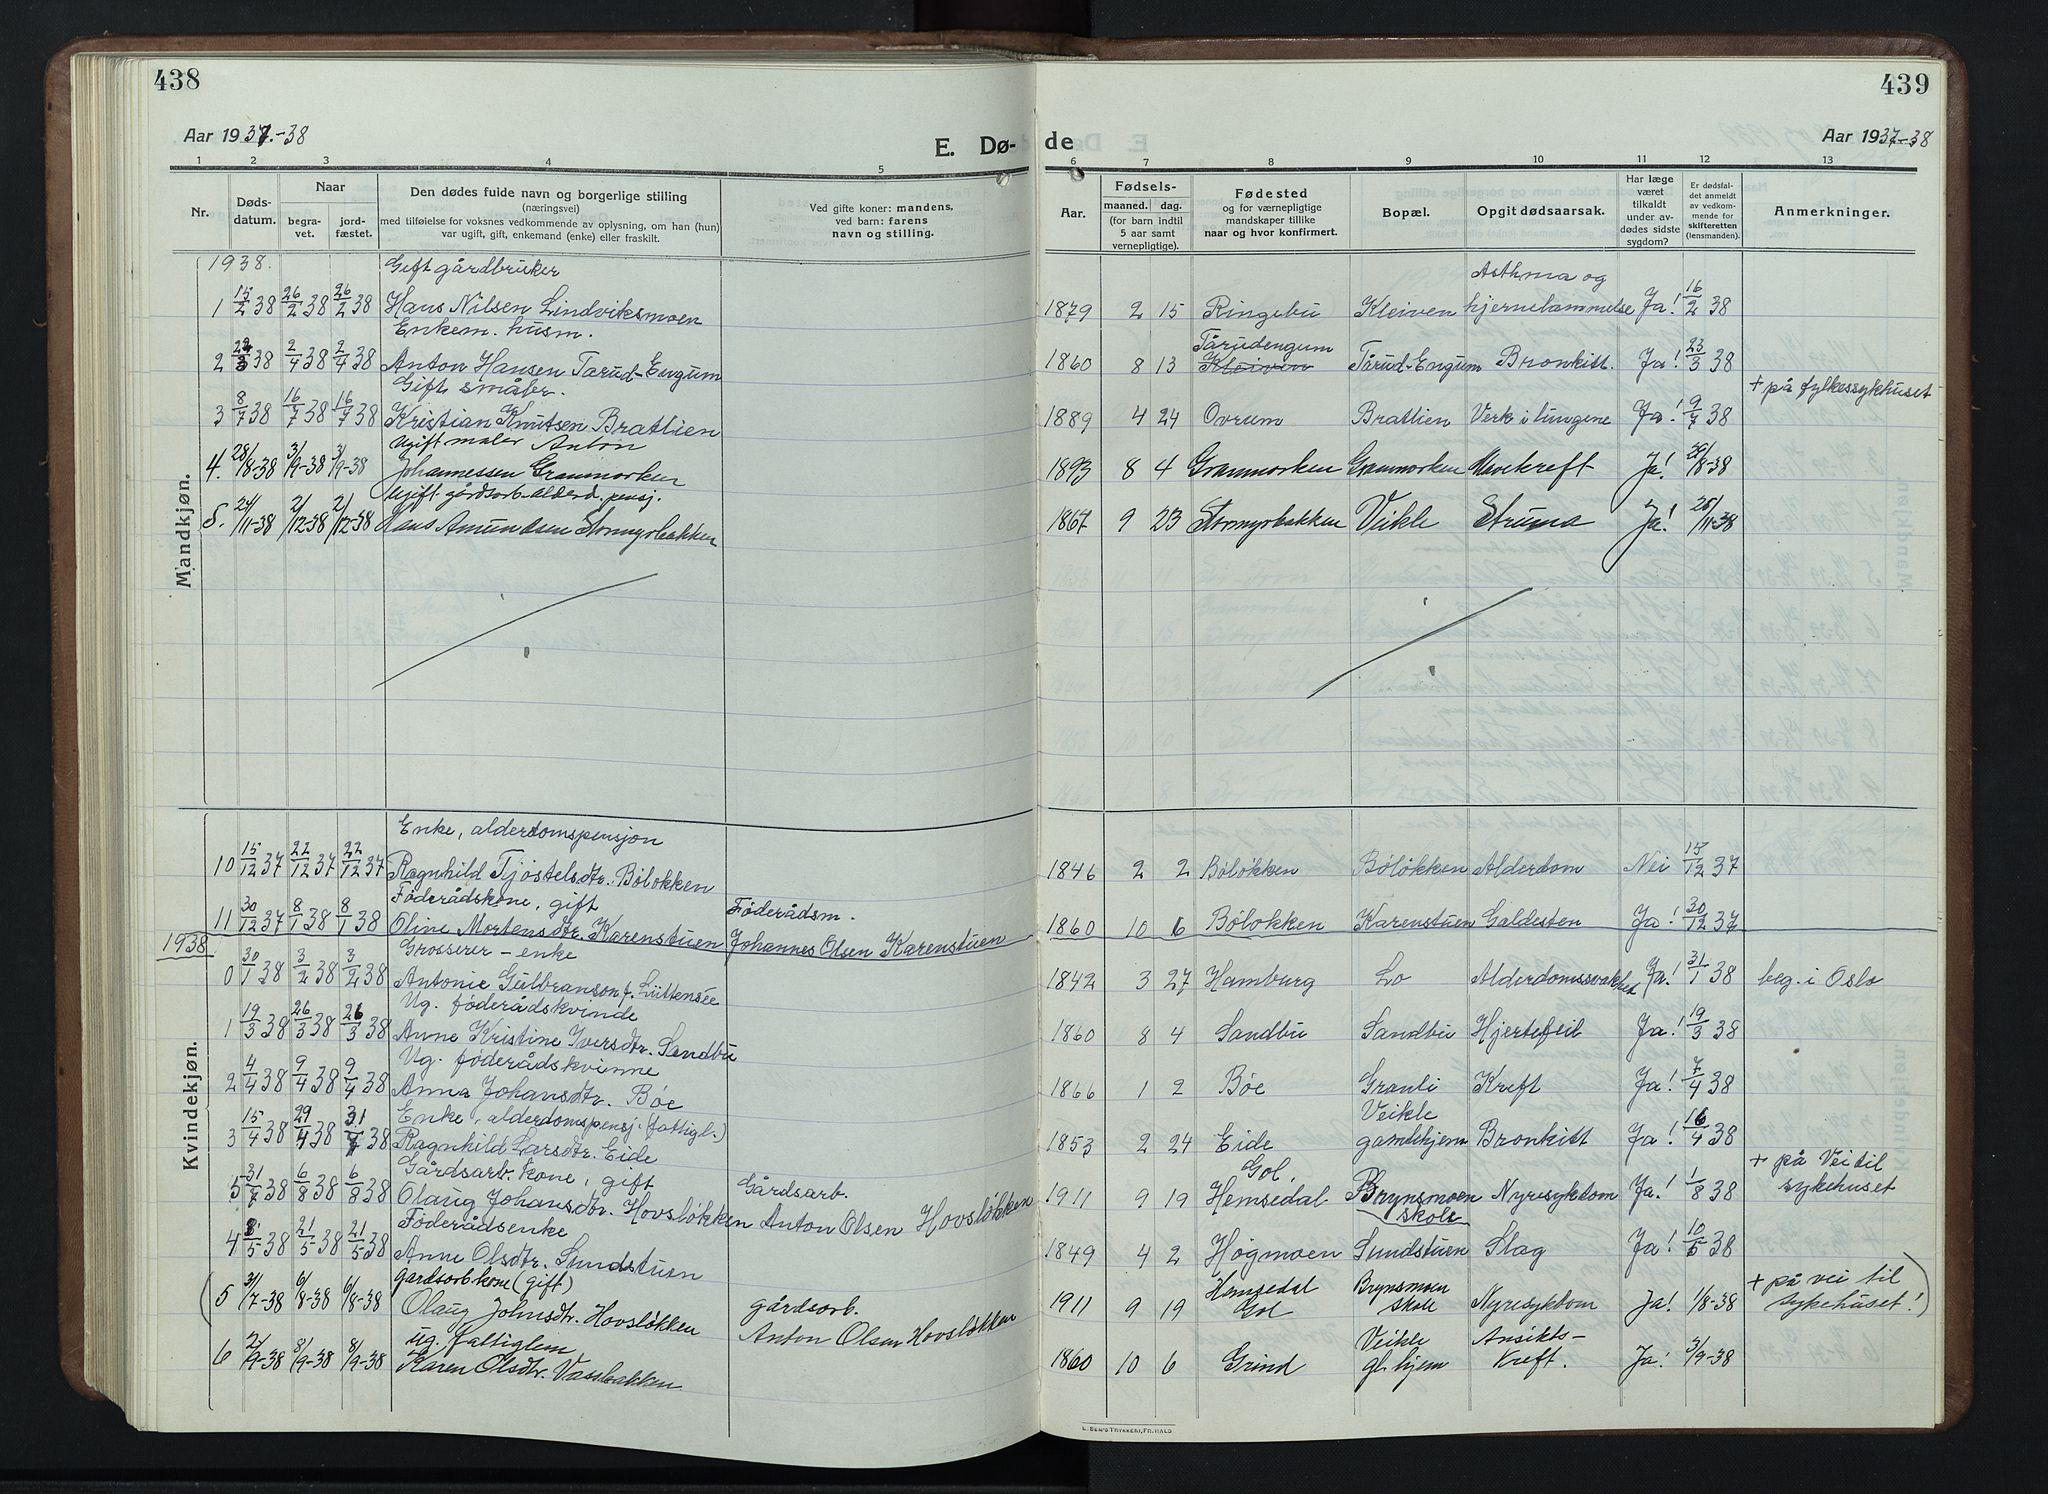 SAH, Nord-Fron prestekontor, Klokkerbok nr. 7, 1915-1946, s. 438-439